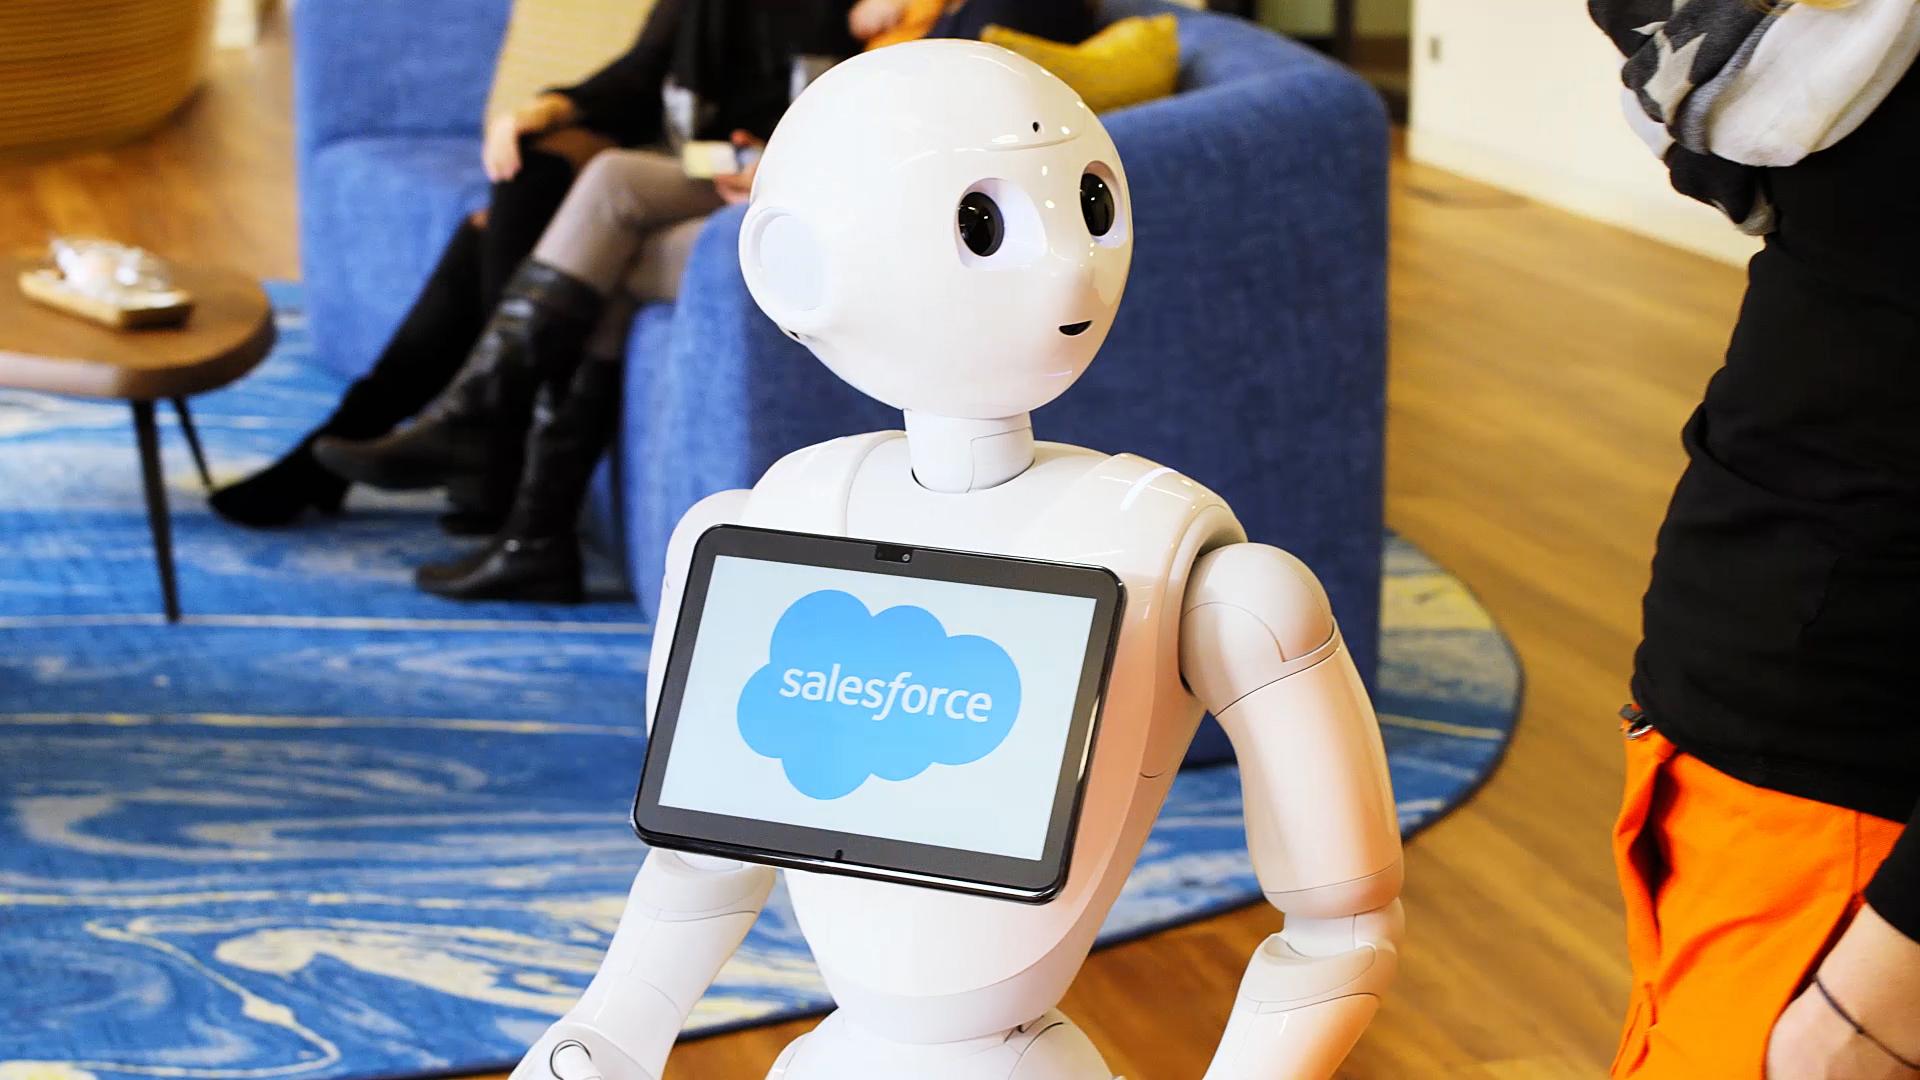 Salesforce Executive Briefing Center Corporate